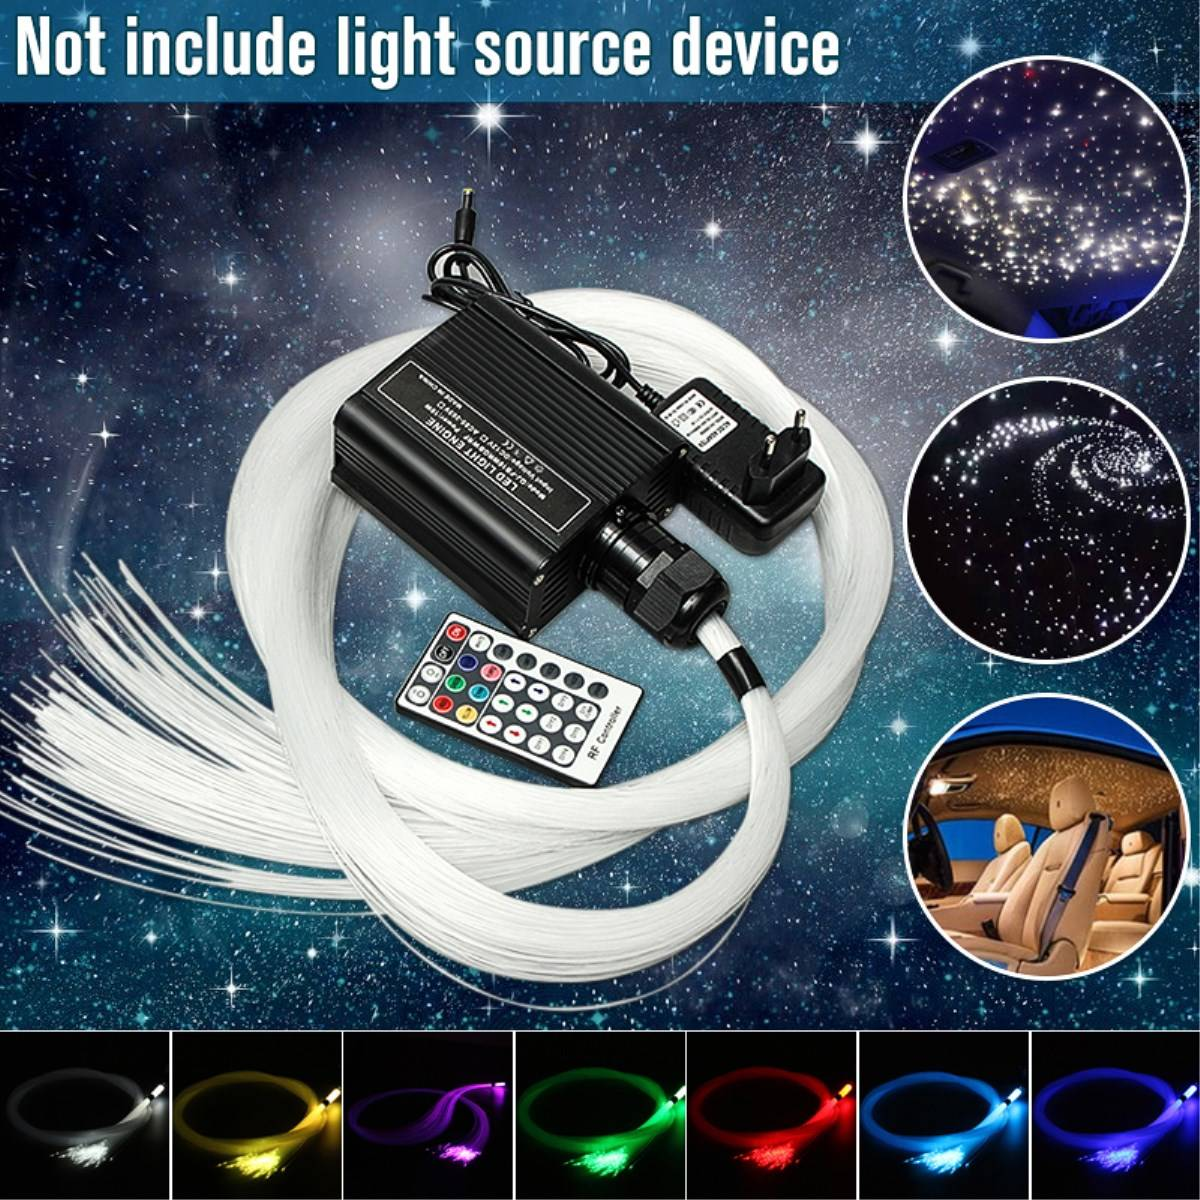 300pcs Optic Fiber Lights RGB Twinkle LED Fiber Optic Star Ceiling Light 2m*0.75mm Optical Fiber Cable